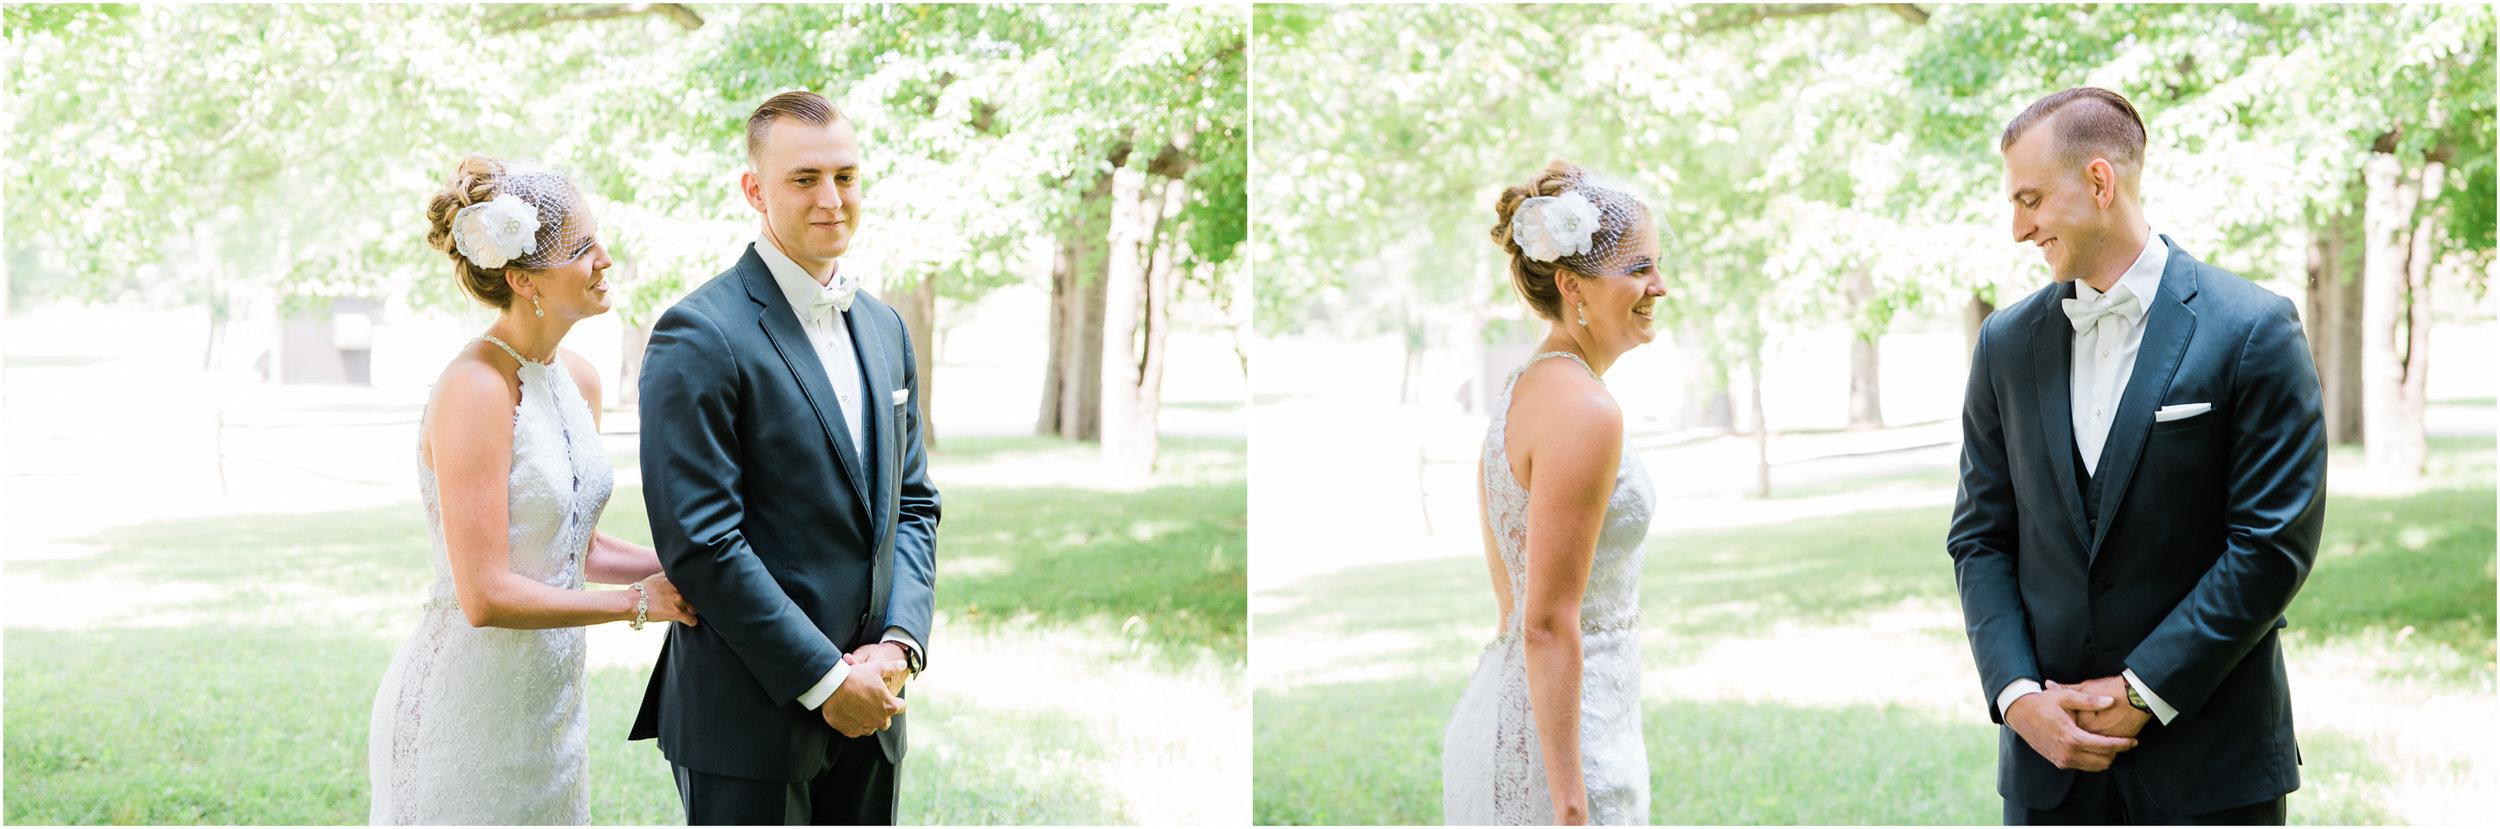 First Look, Bride and Groom Foggy Mountain Wedding.jpg